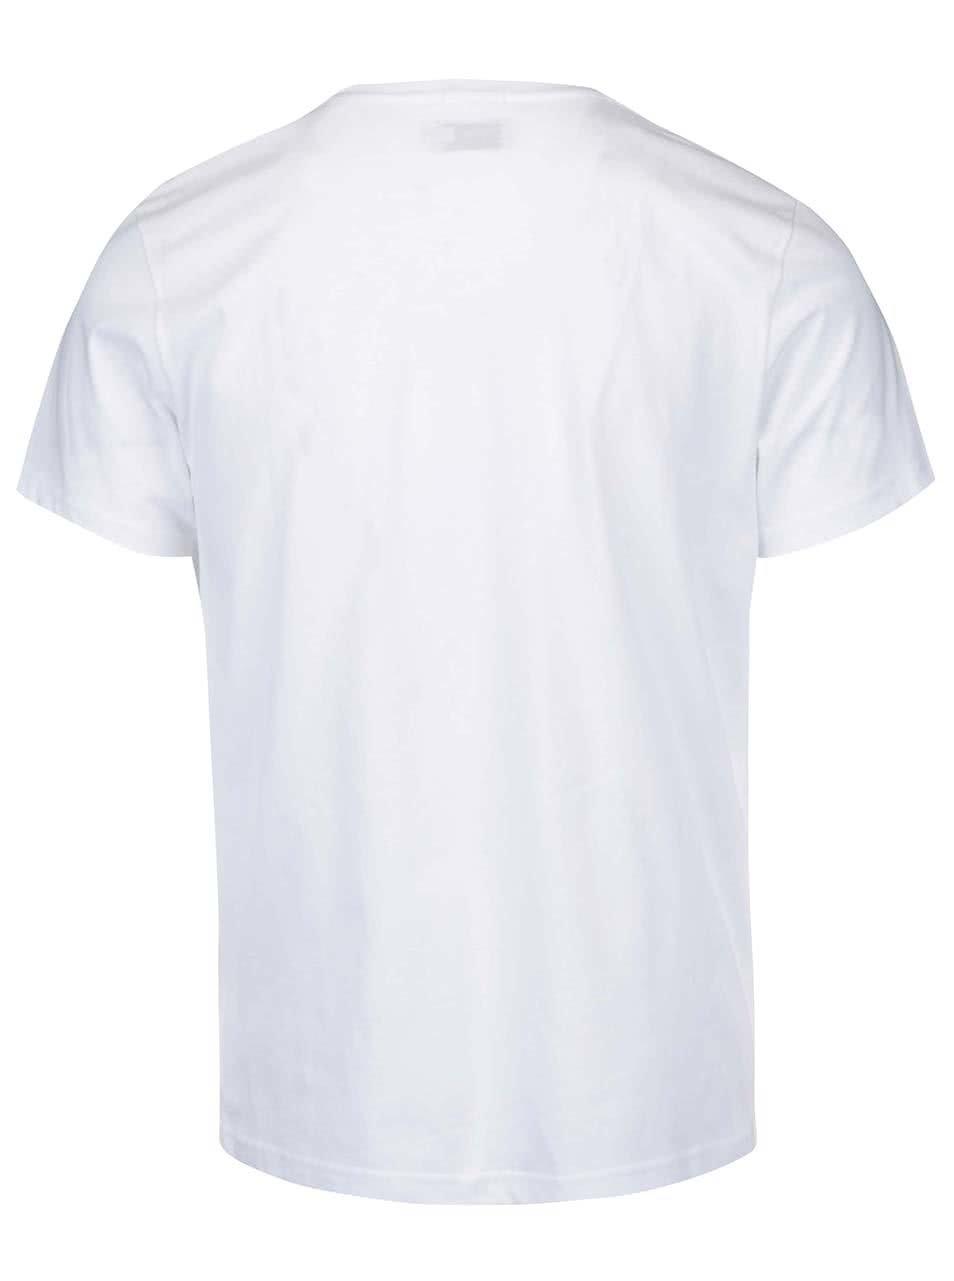 5f7ed631847 Bílé pánské triko s nápisem Pepe Jeans Eggo ...